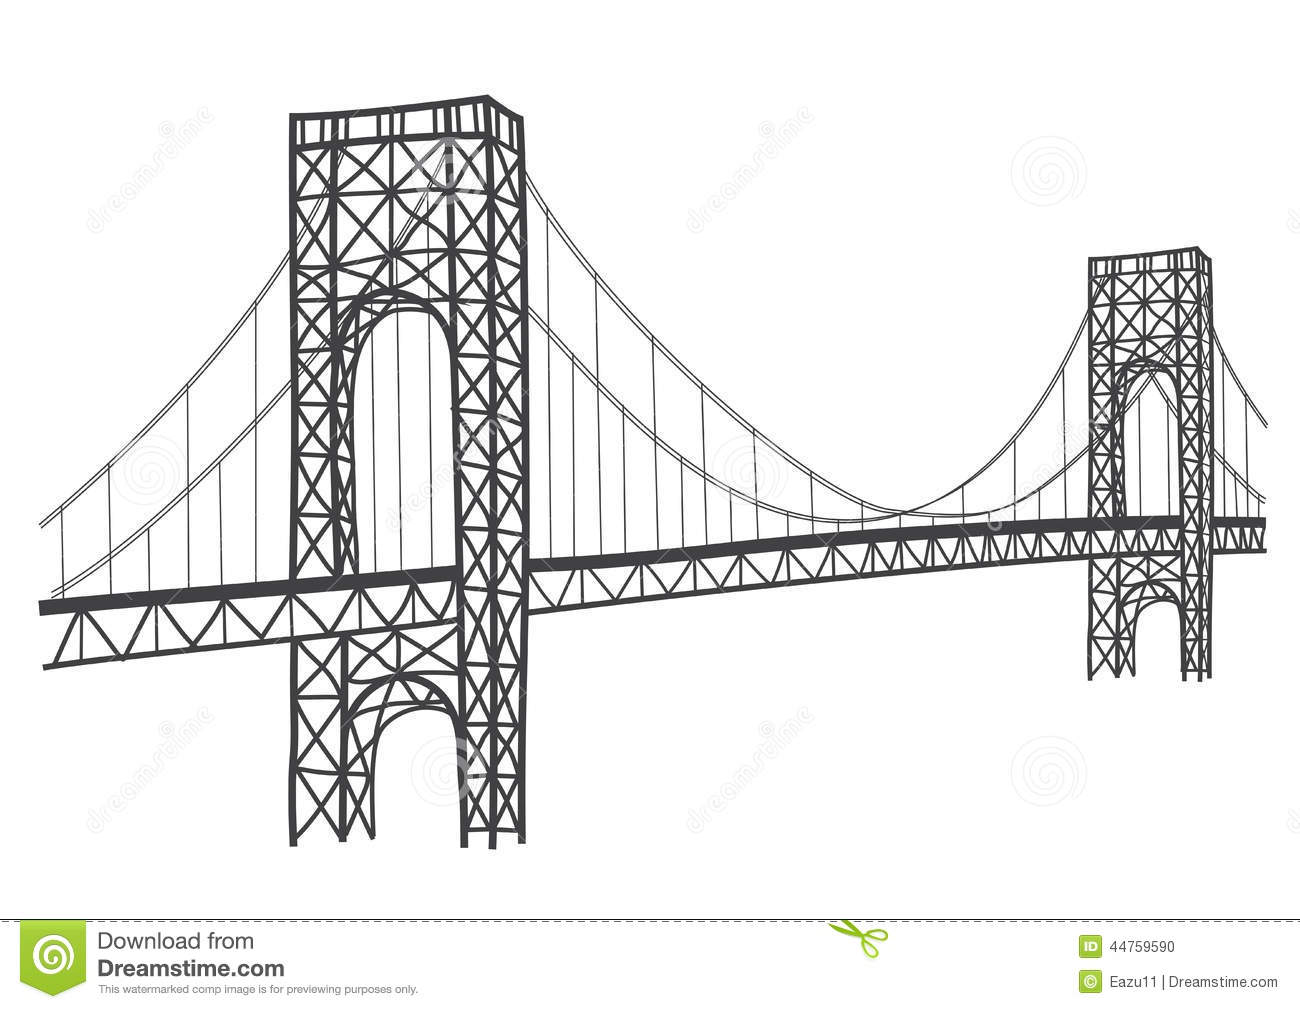 bridges clip art free clipart panda free clipart images rh clipartpanda com bridge clip art bridge clipart images